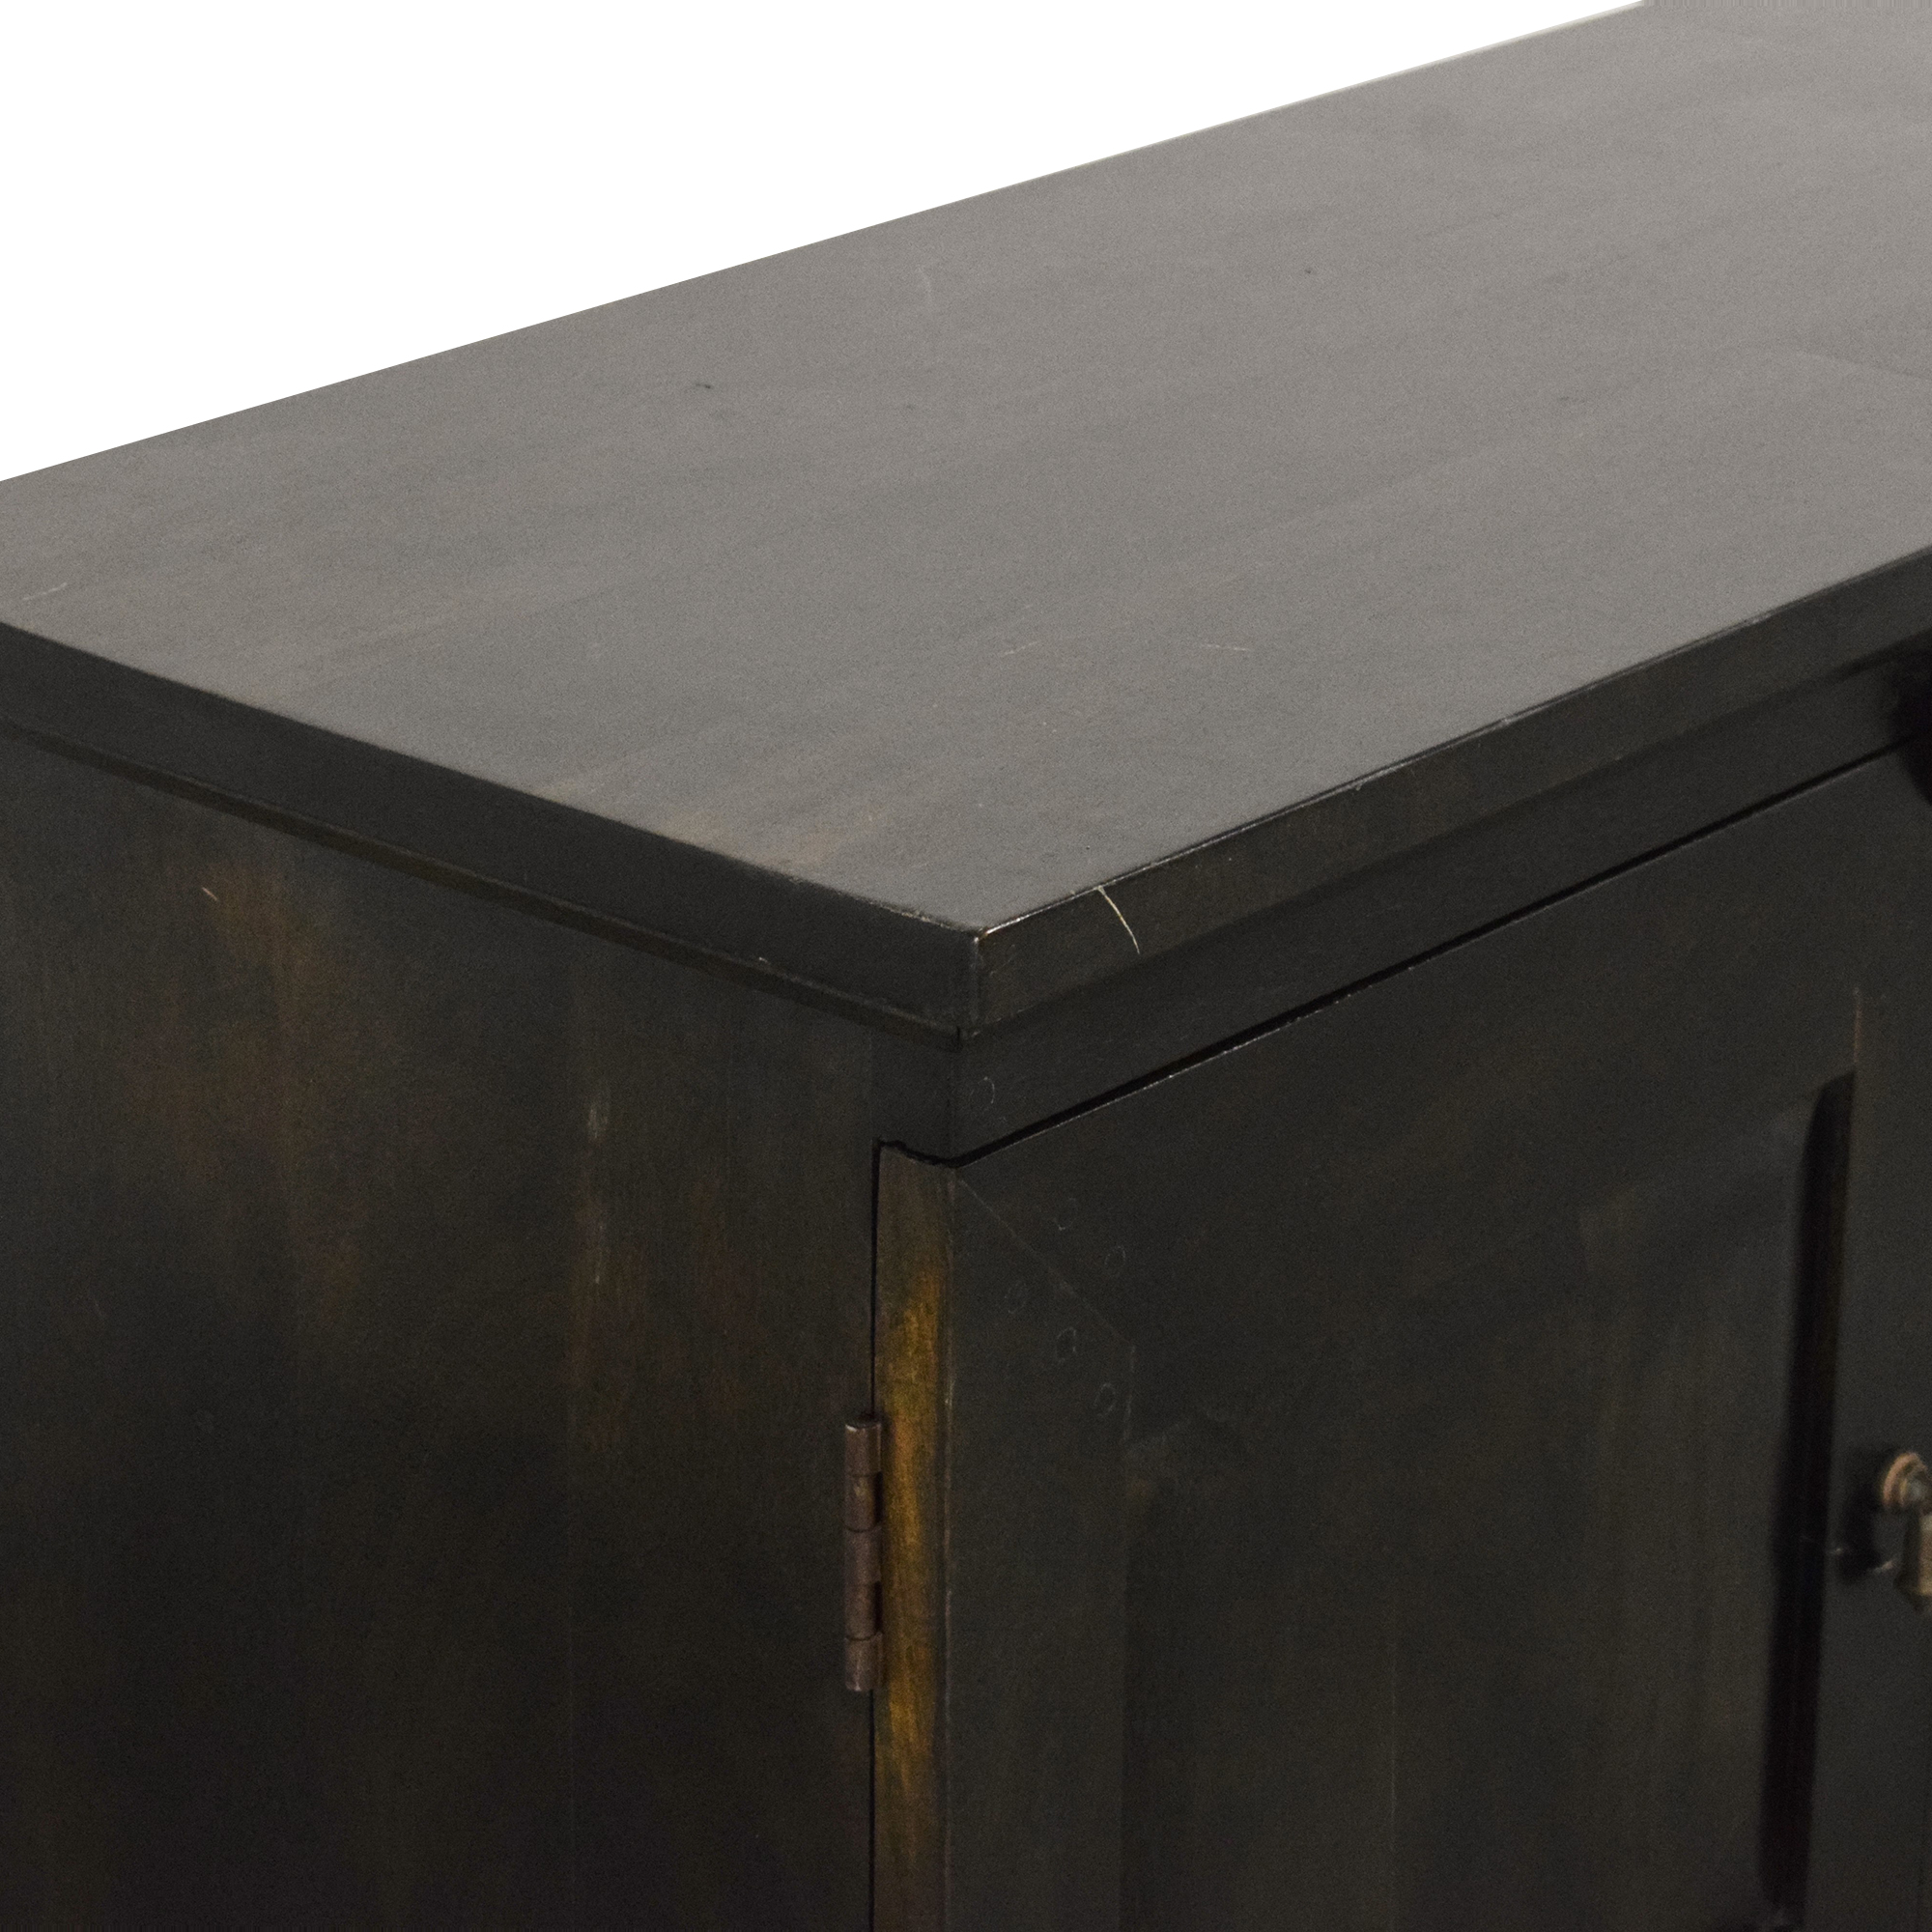 Crate & Barrel Crate & Barrel Custom Basque Media Console dark brown